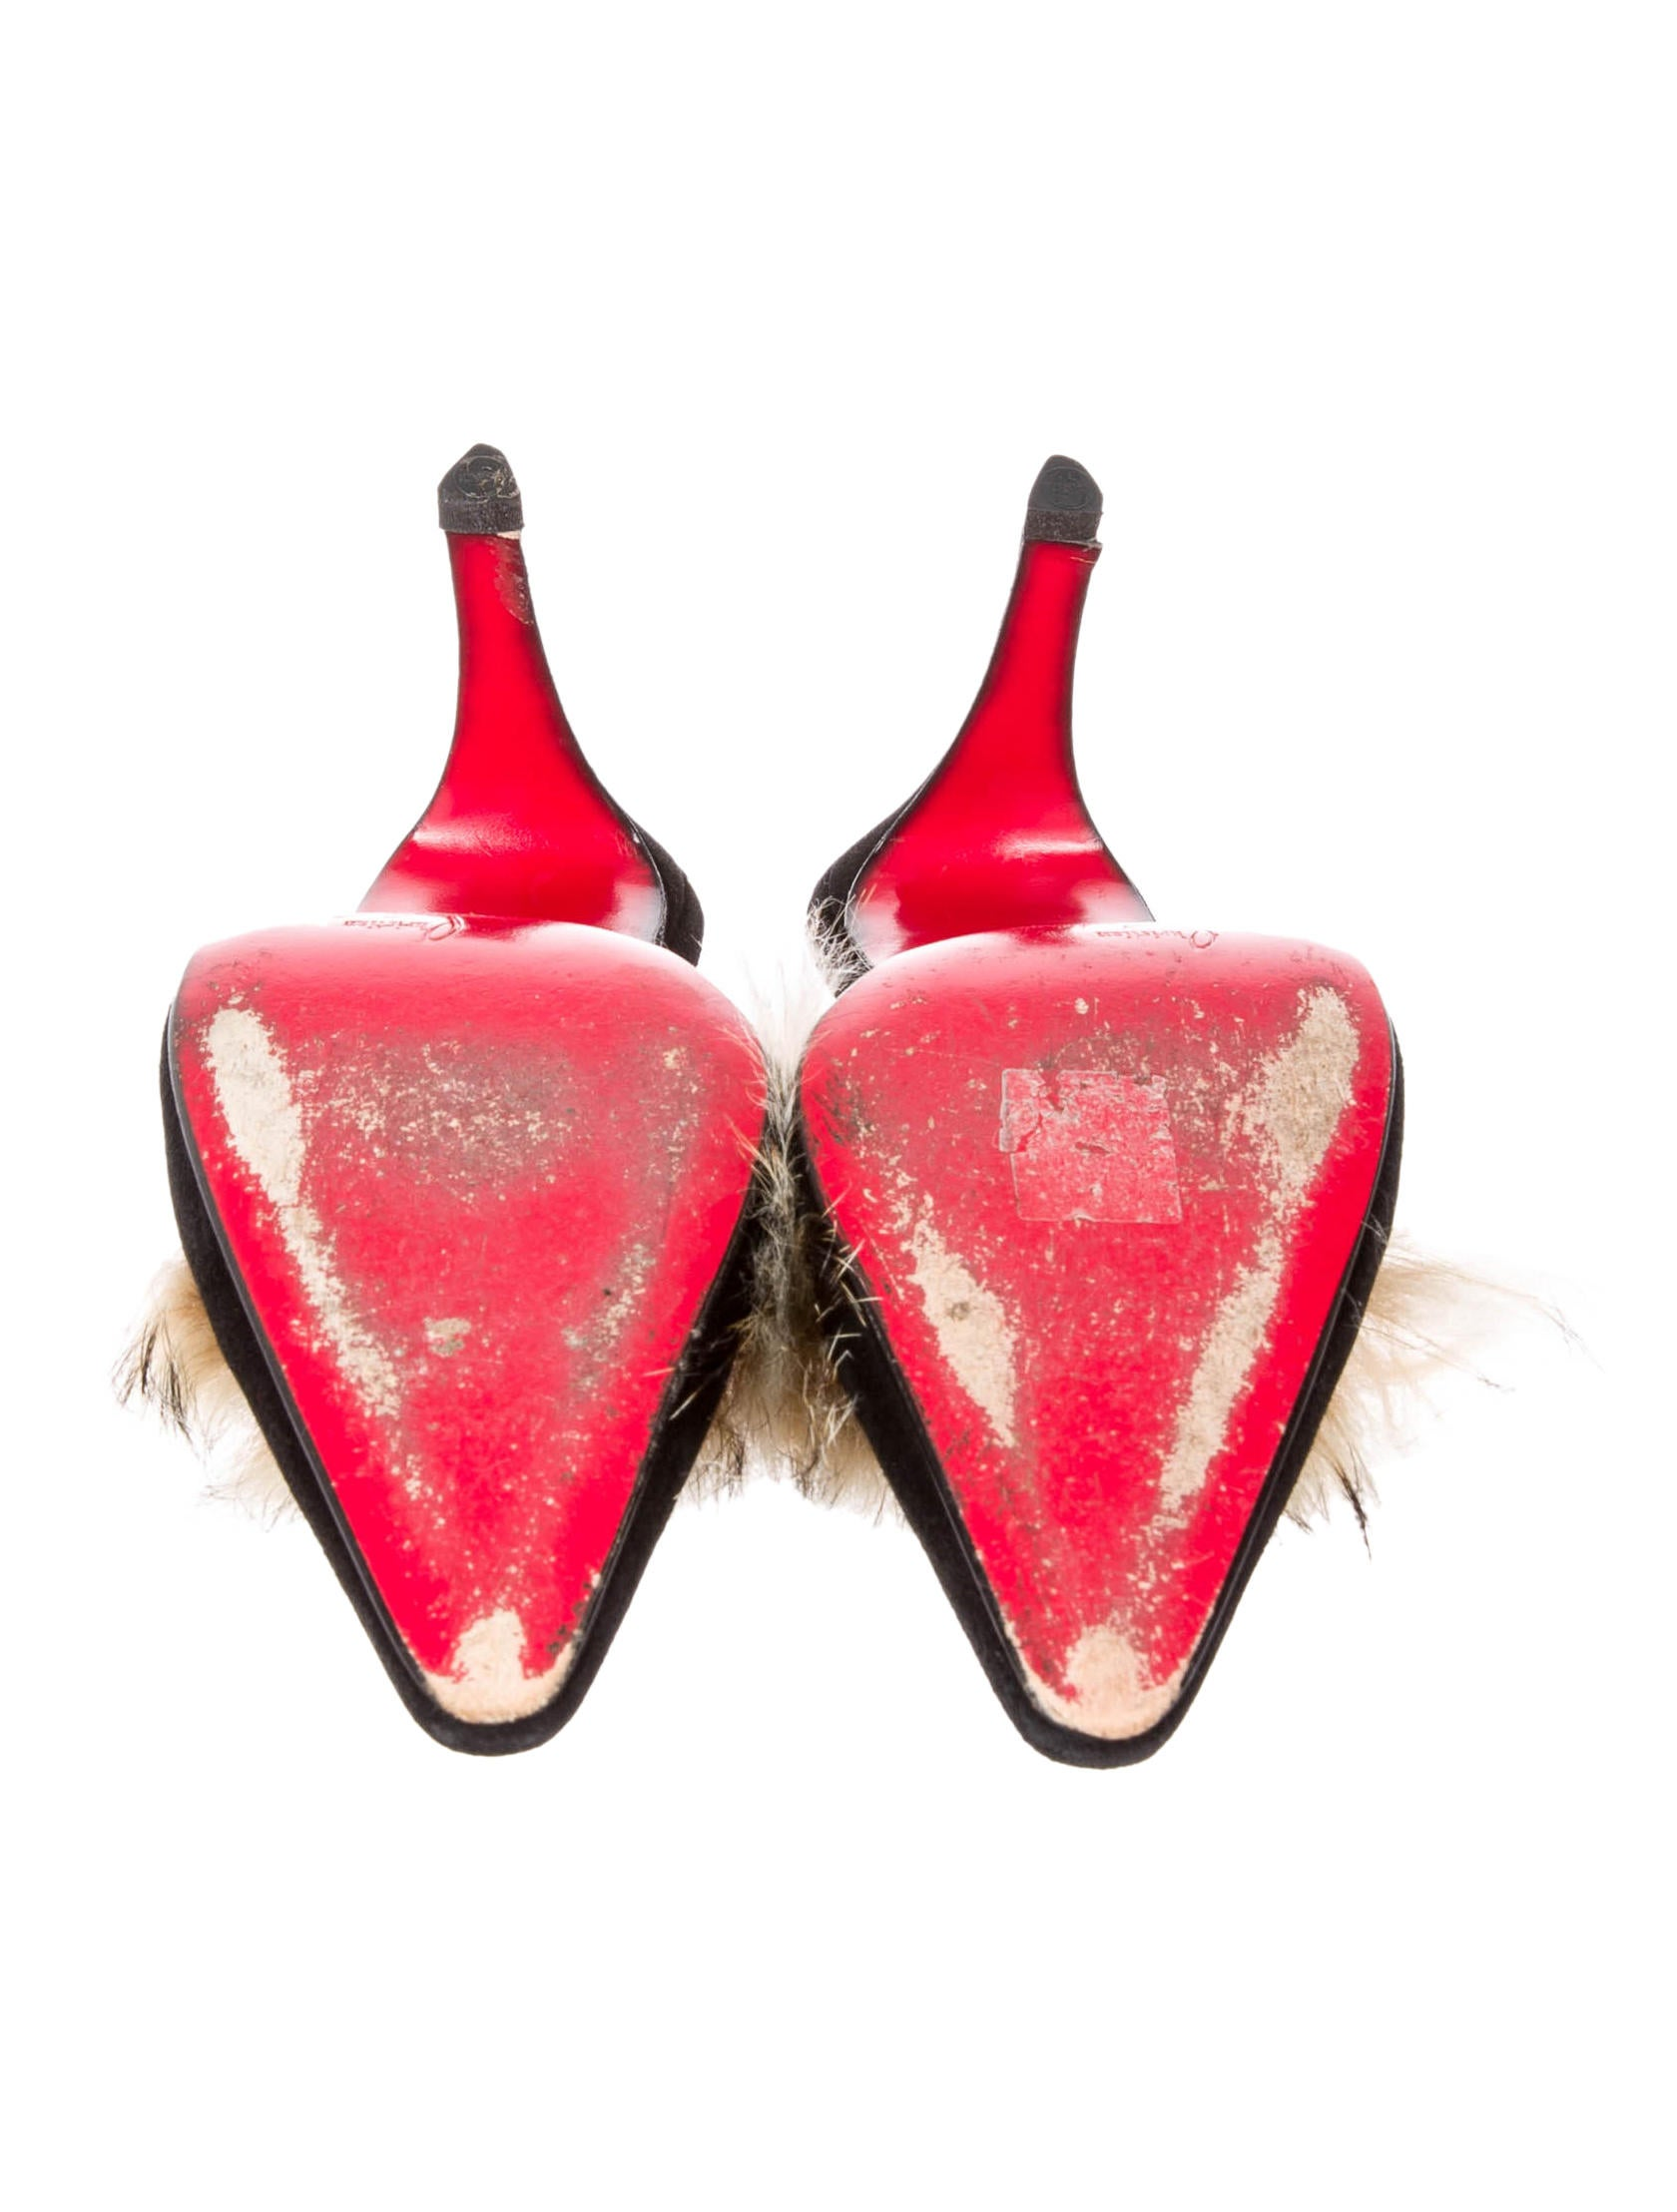 christian louboutin shoes replica - Christian Louboutin Fox Trim Mules - Shoes - CHT37685 | The RealReal